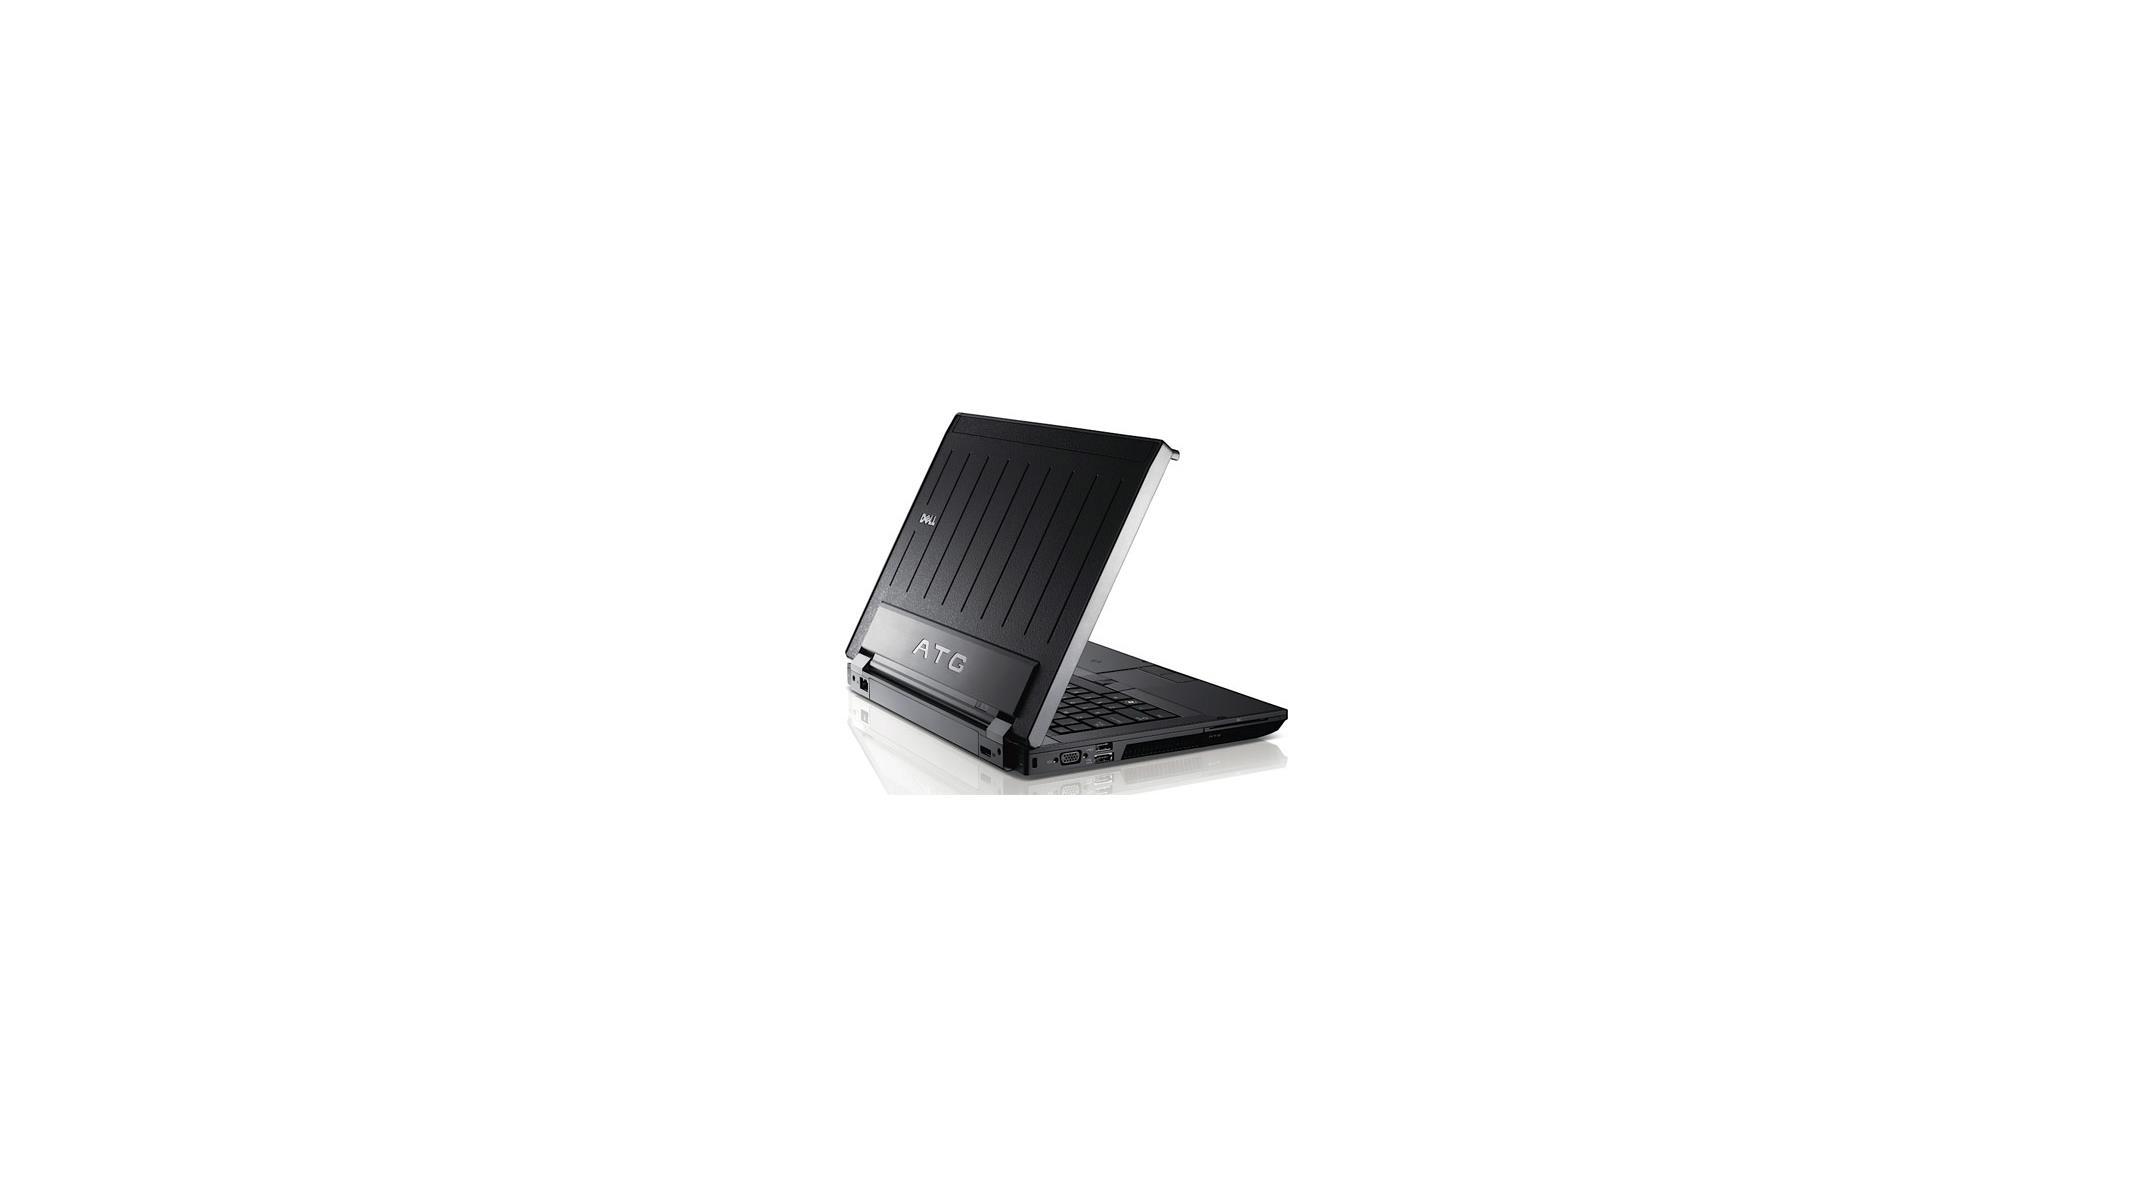 Dell Intros Latitude E6410, E6510 And E6410 ATG Laptops | HotHardware